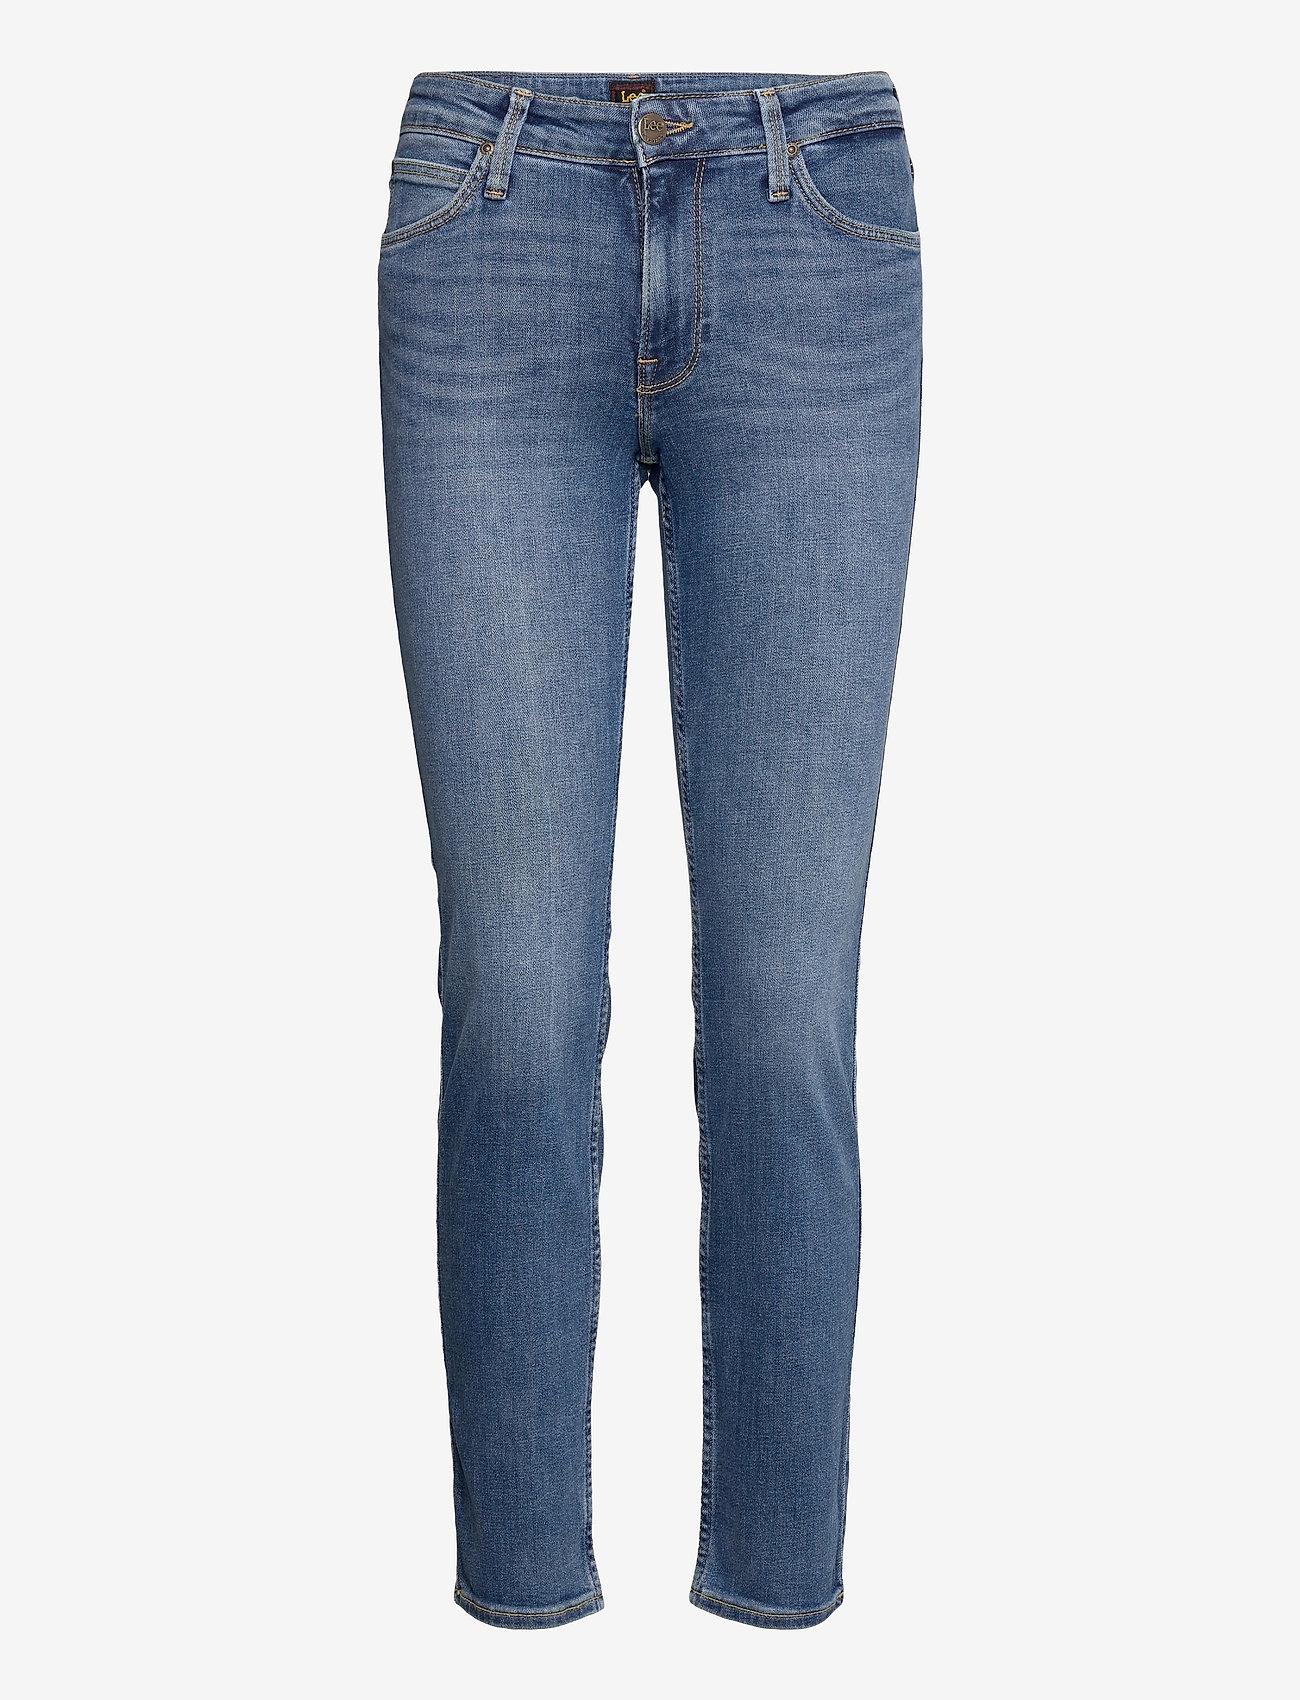 Lee Jeans - ELLY - slim jeans - mid worn martha - 0